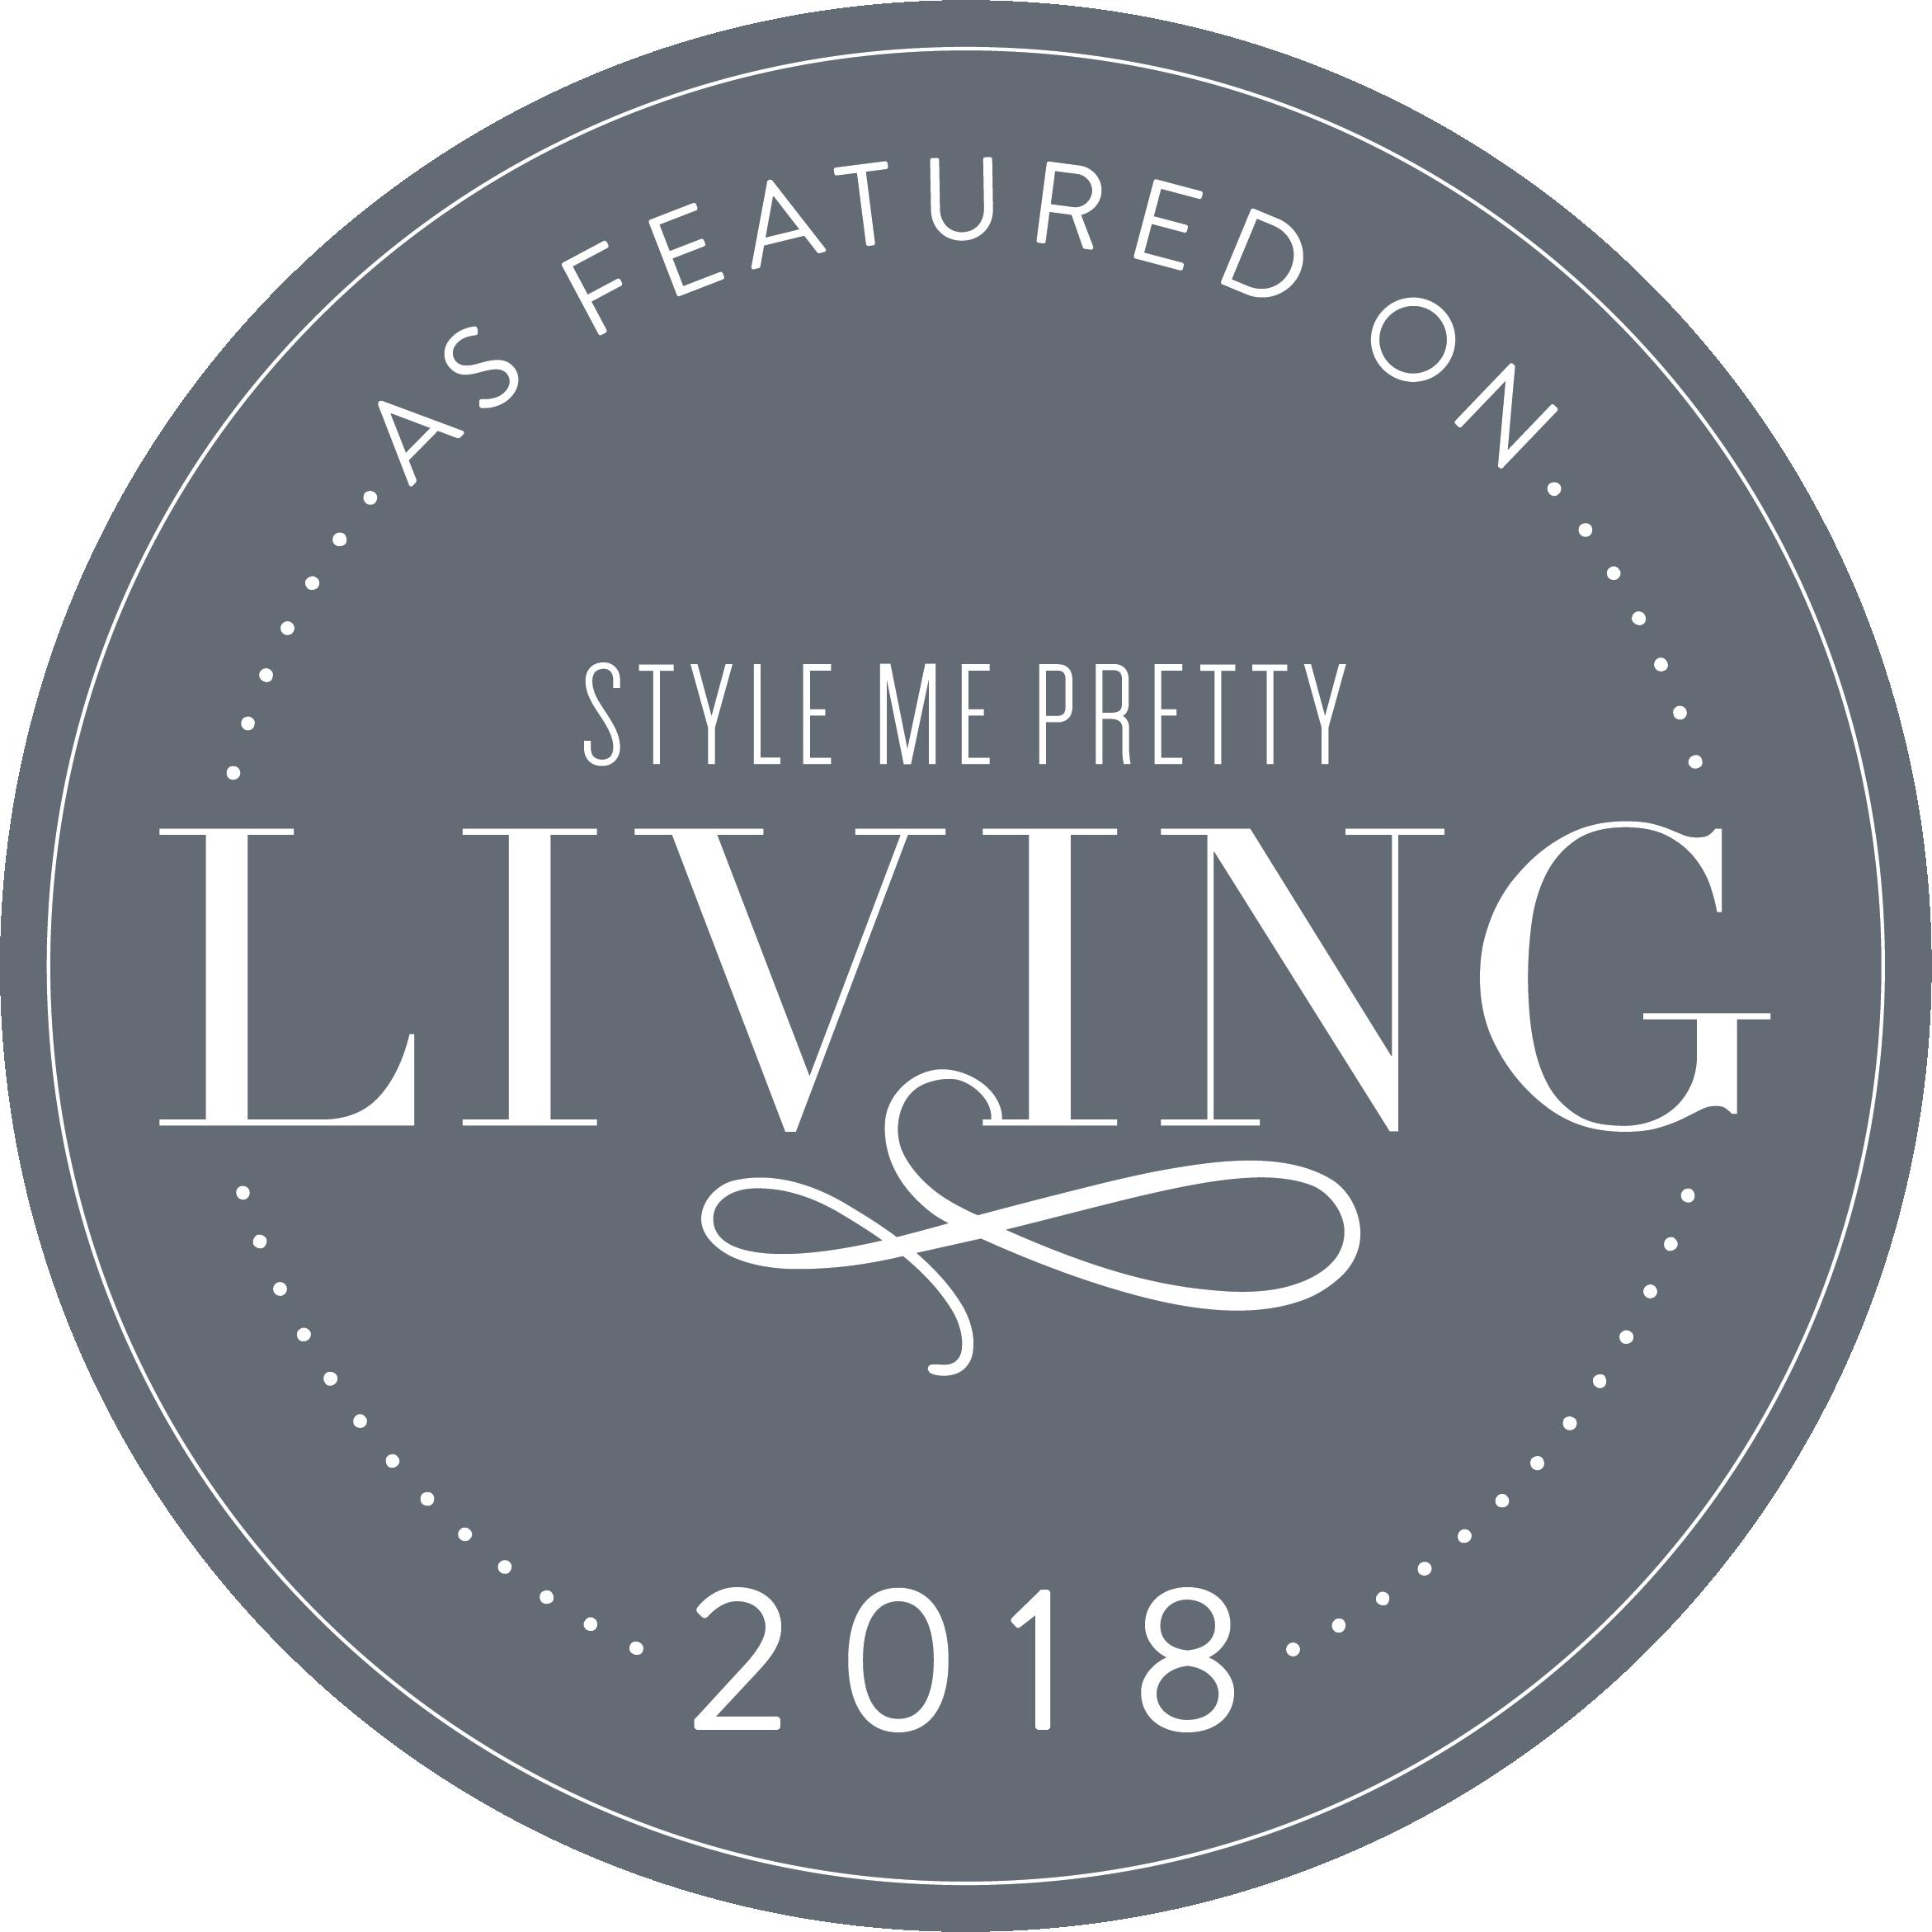 StyleMePrettyLiving.png